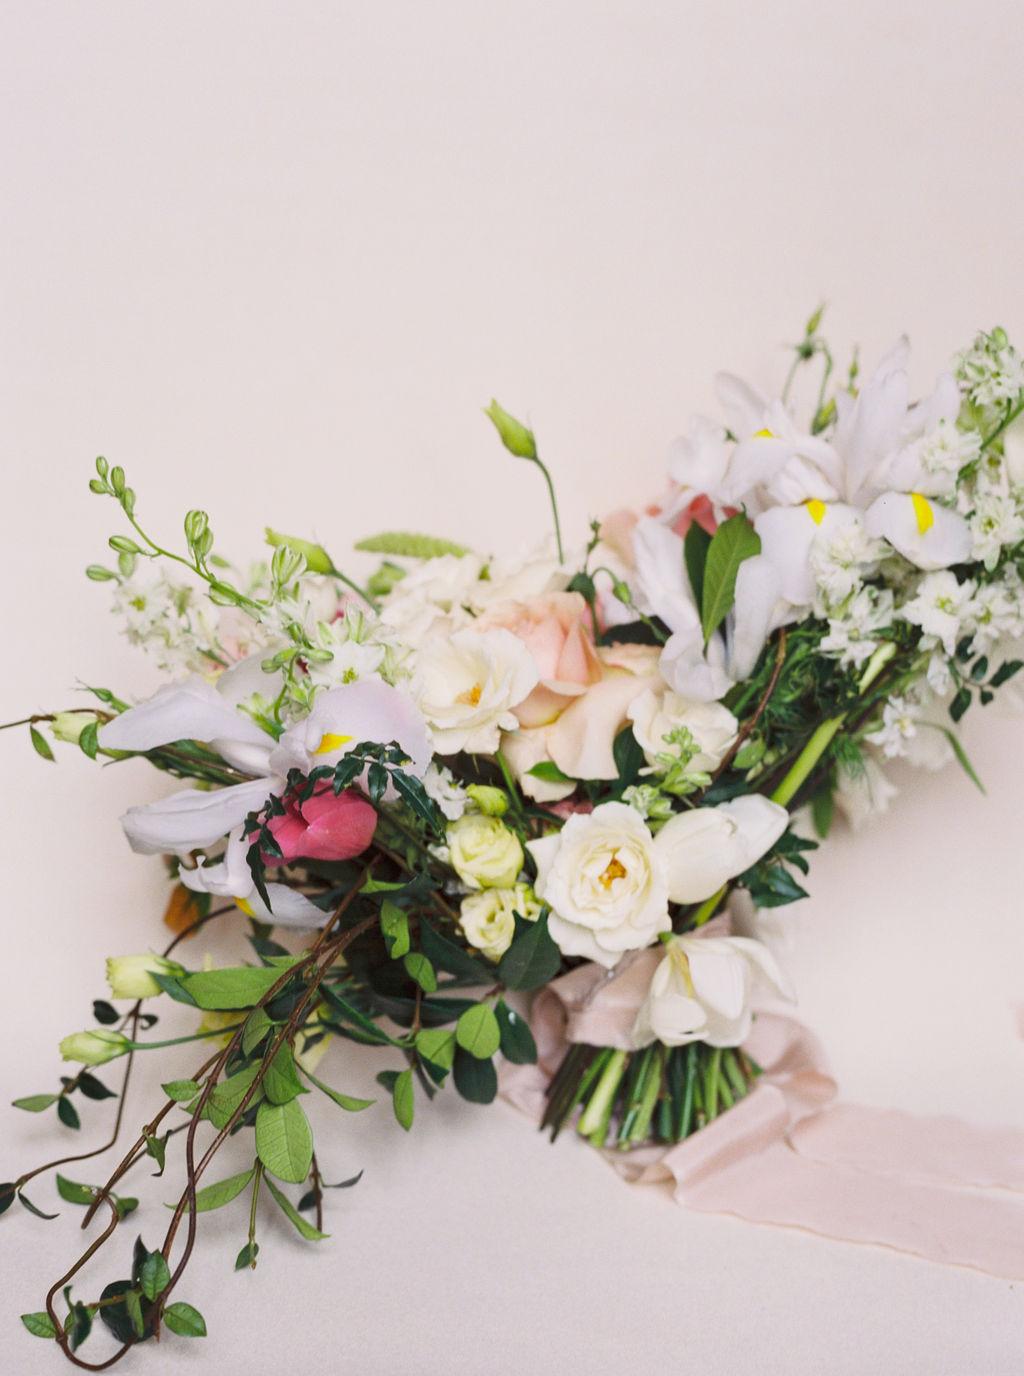 Spring Floral Bouquet Design